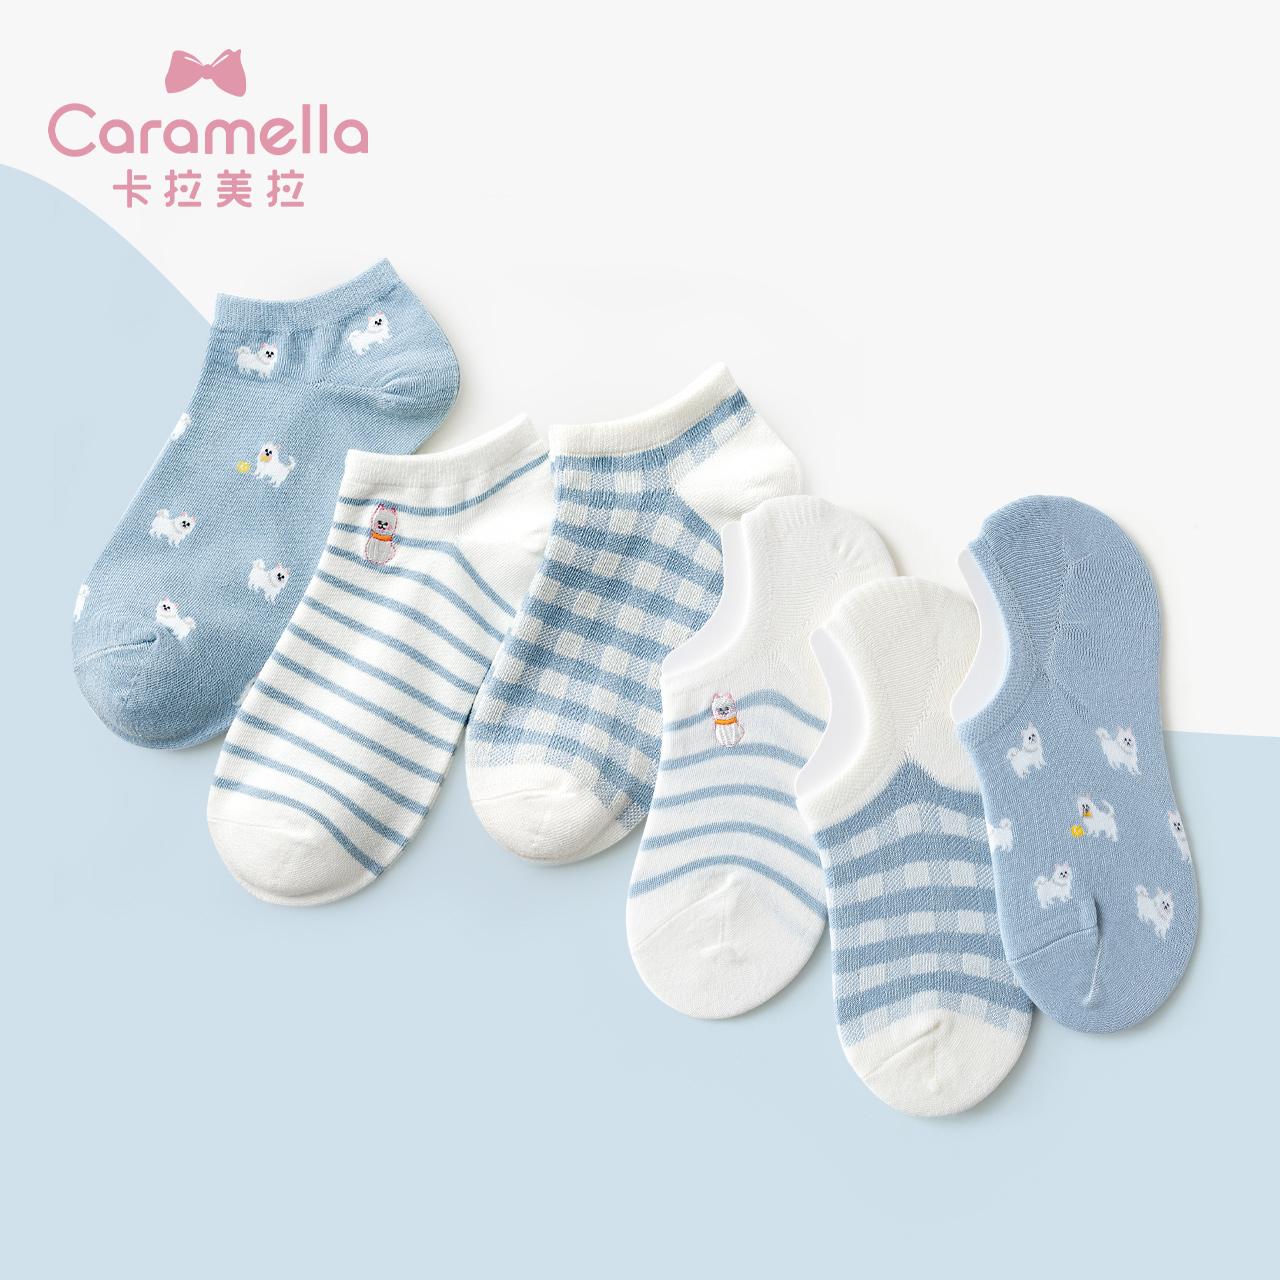 caramella袜子女士ins潮春夏秋季小奶汪船袜浅口薄款棉袜子短筒袜